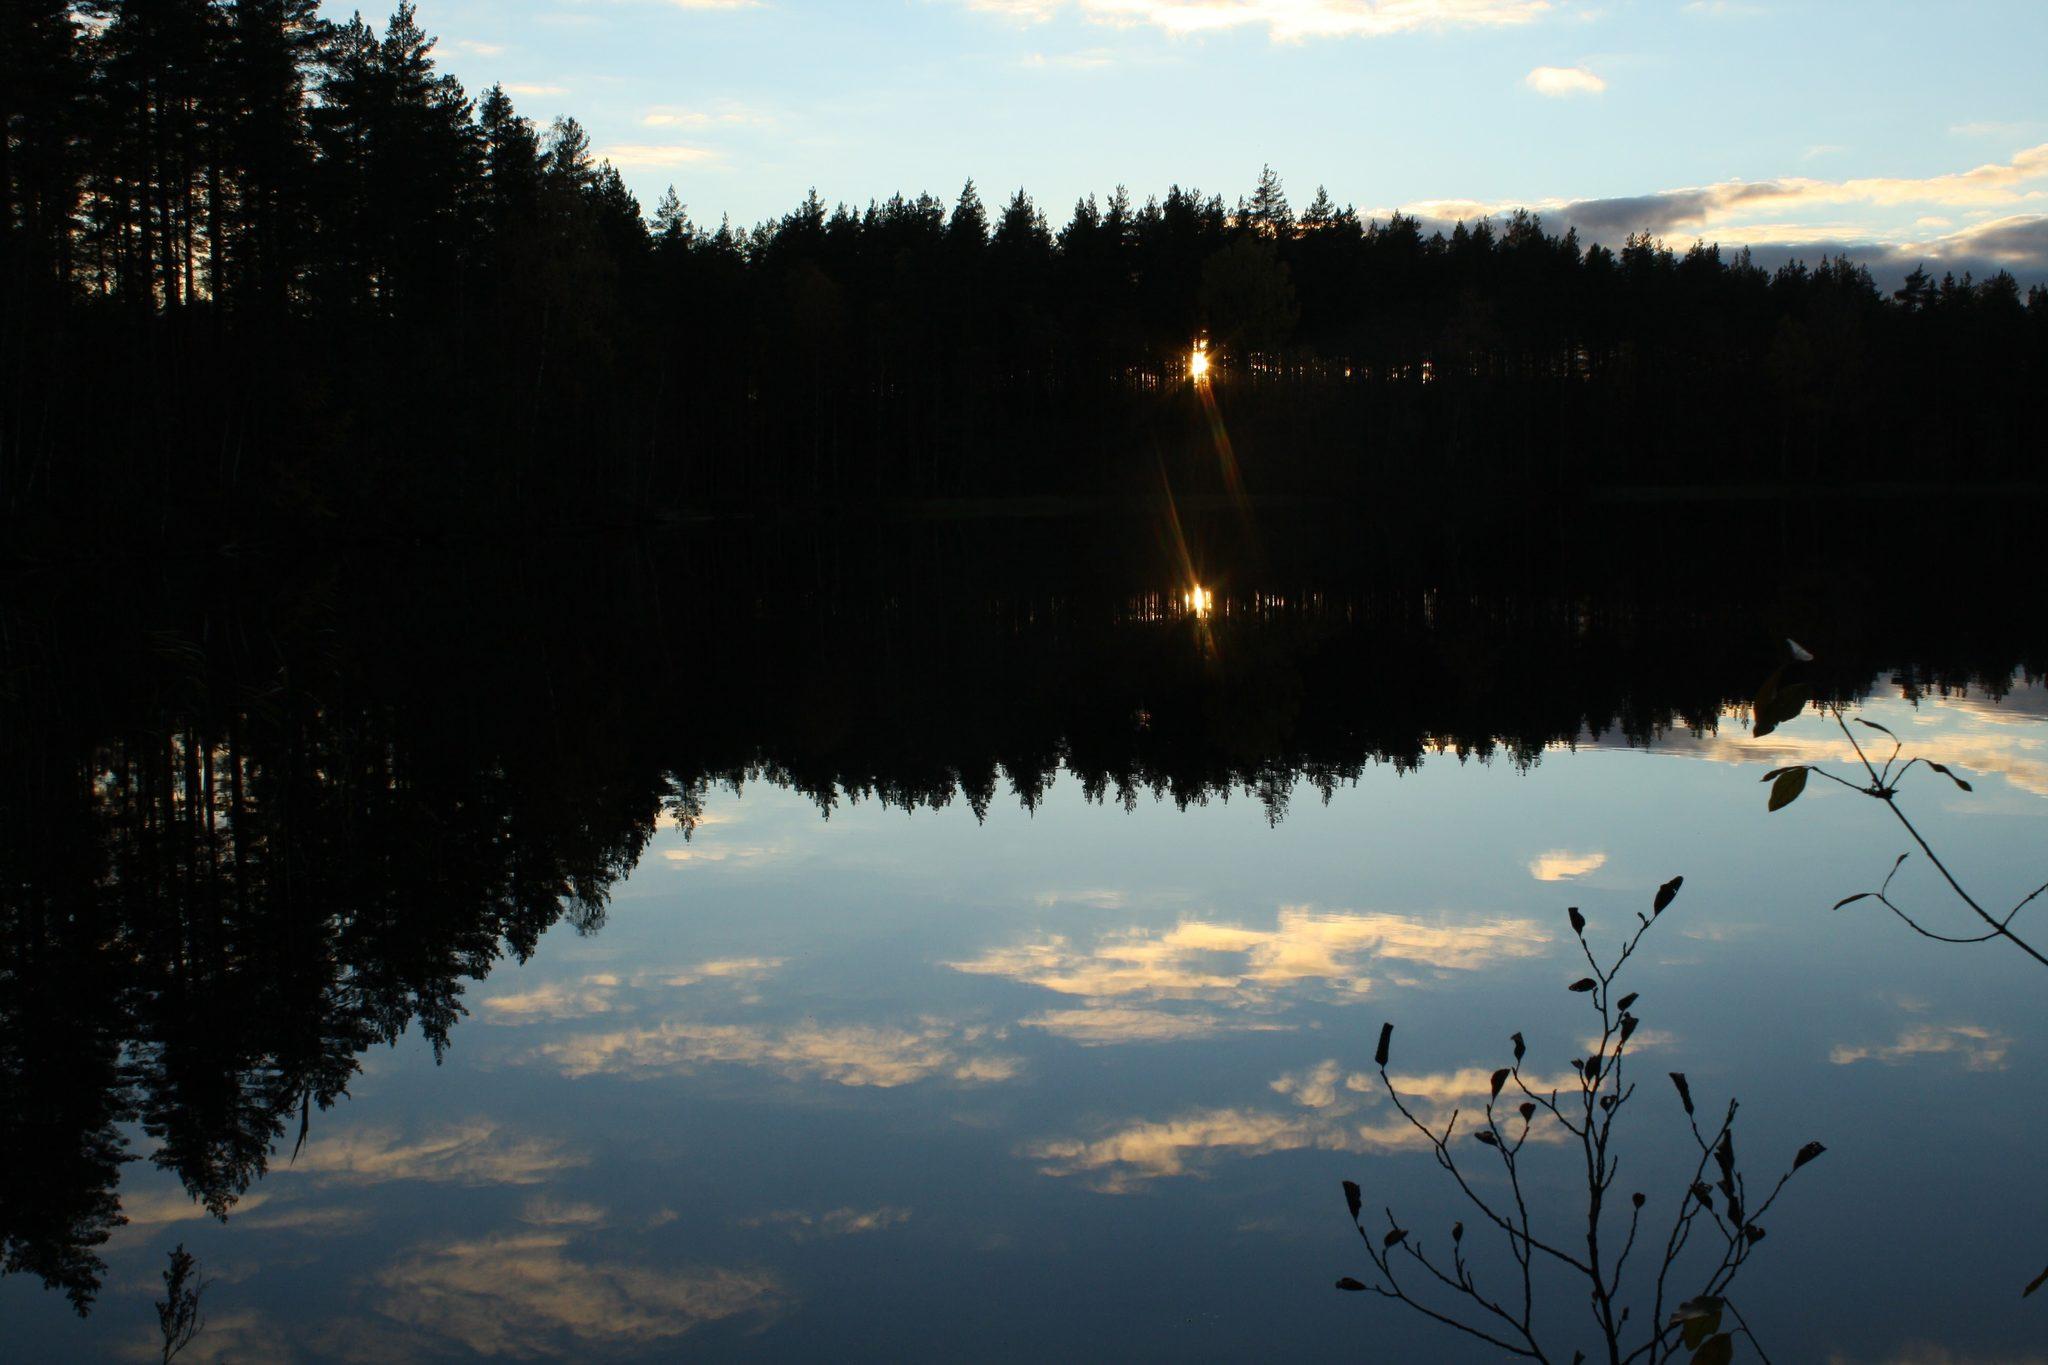 Daytime Hiking in the Tavastia Lake Uplands